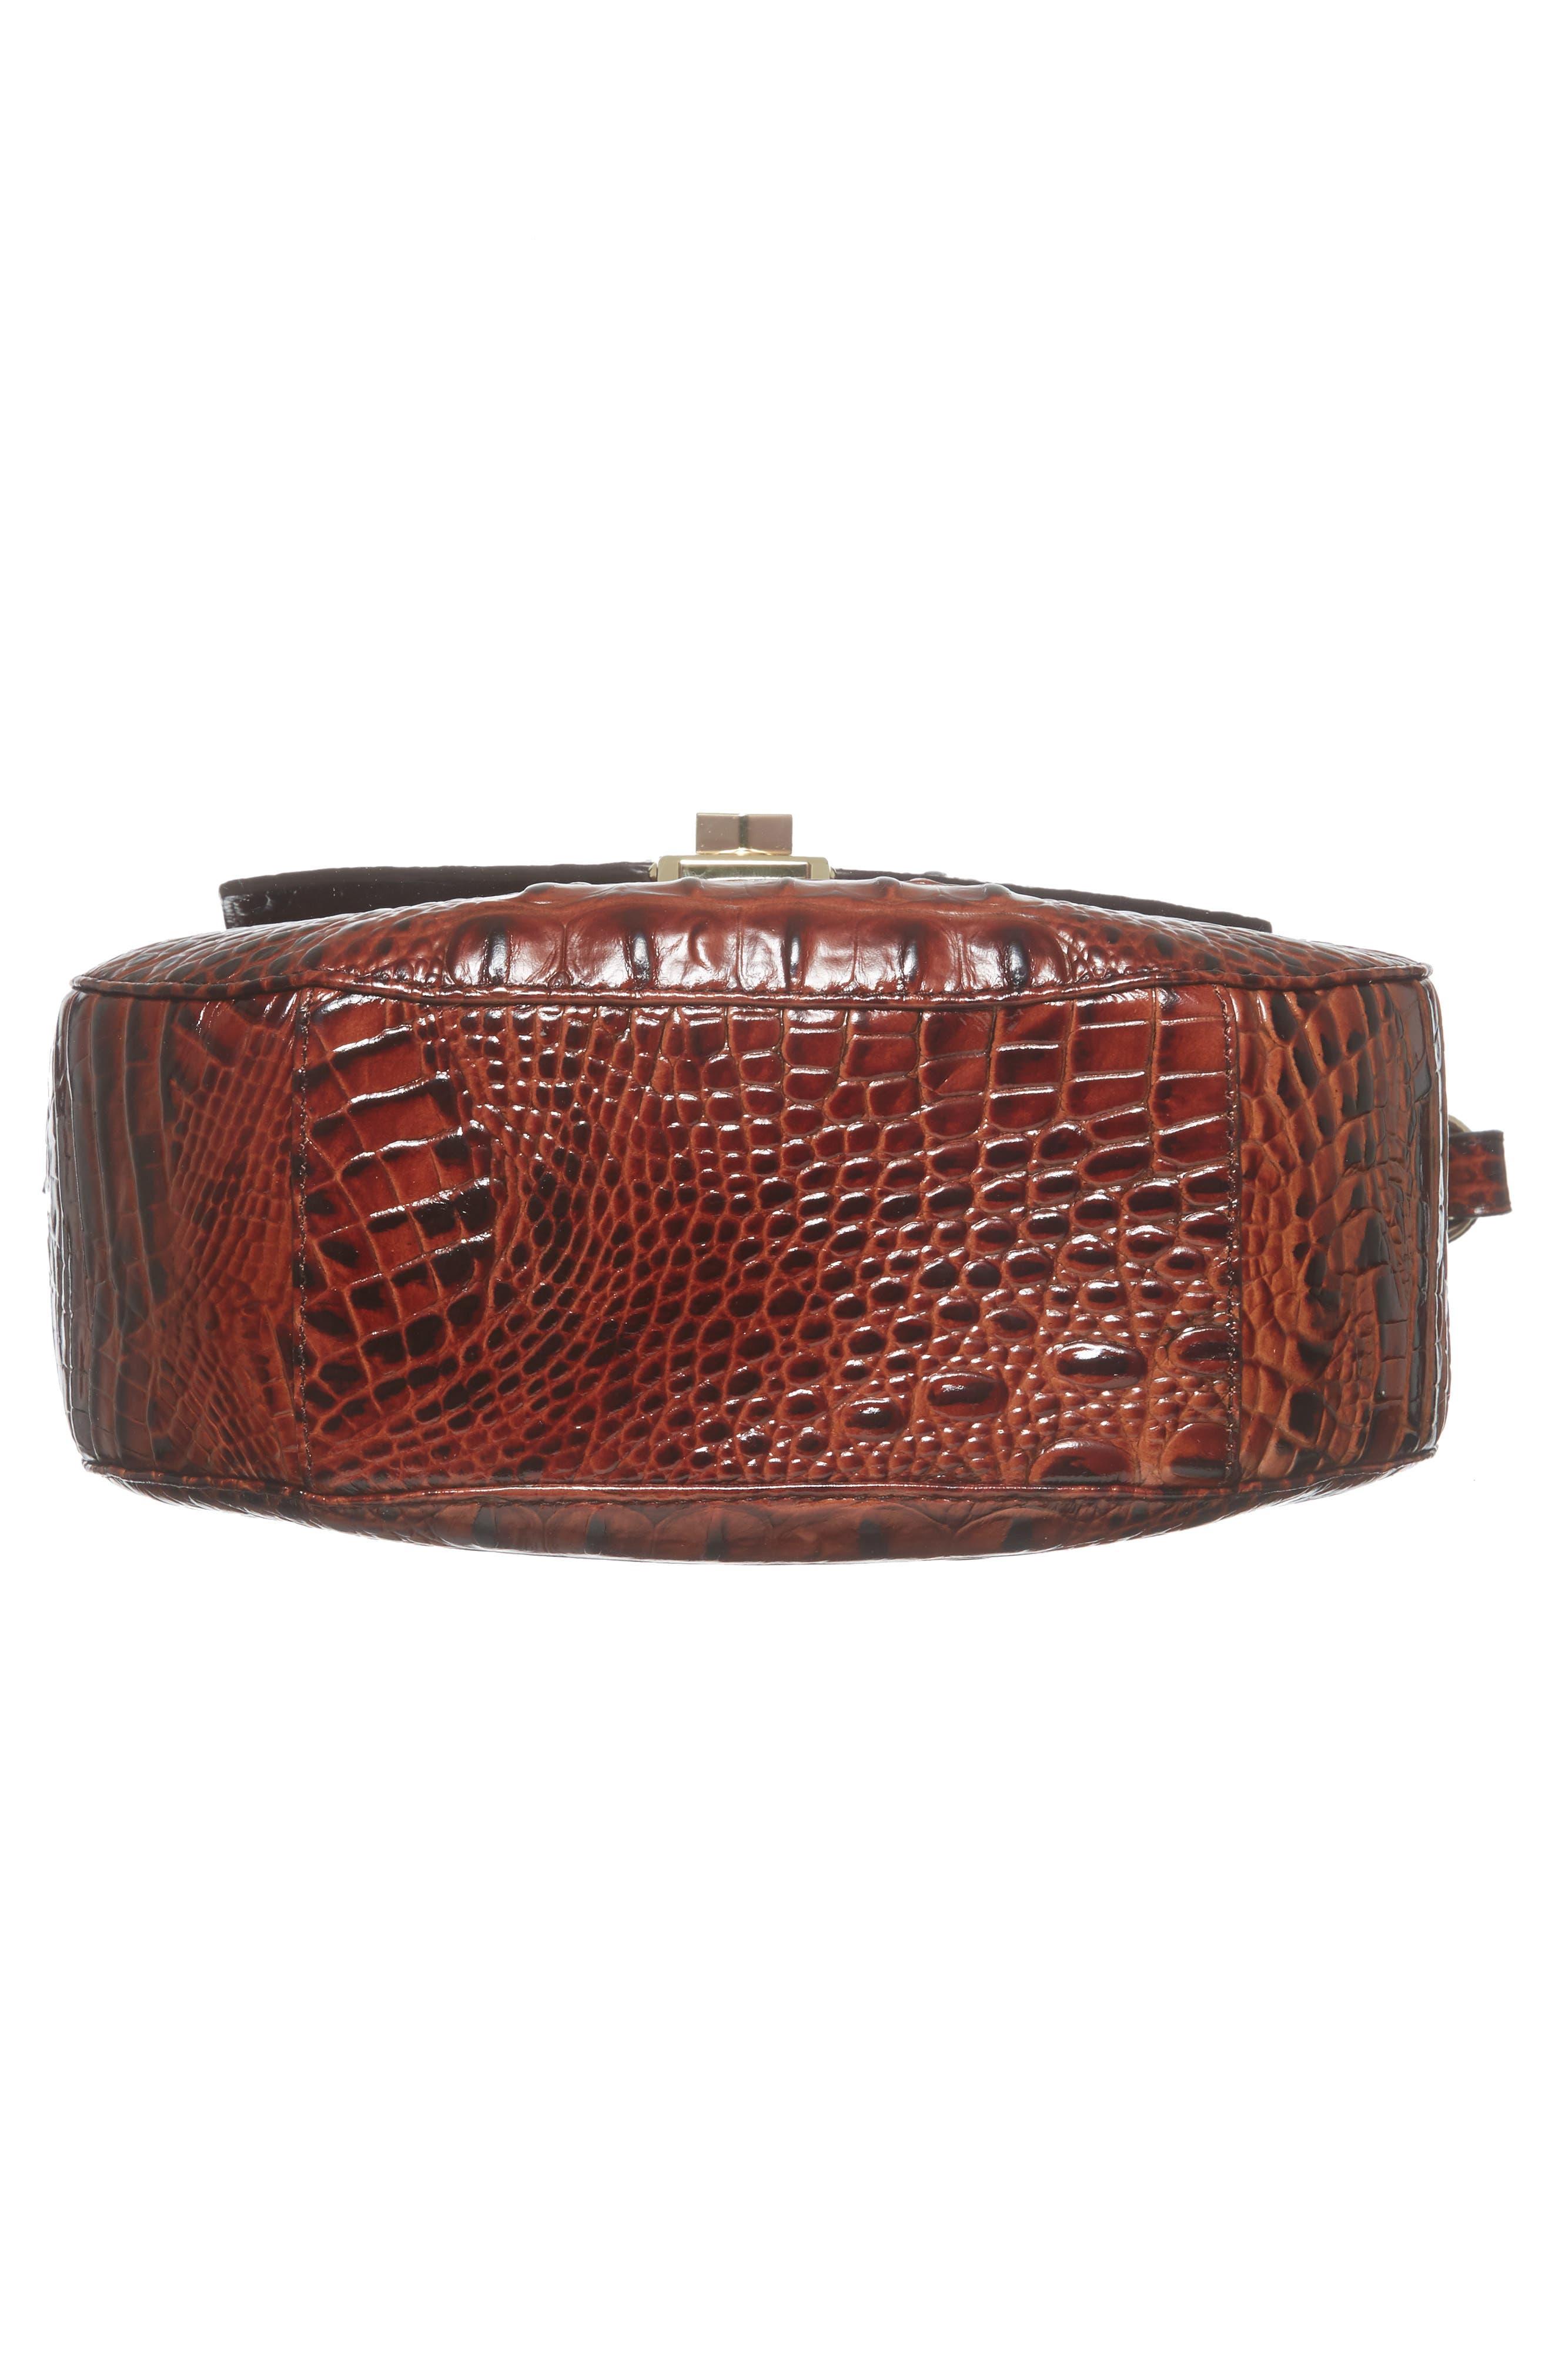 Melbourne - Lizzie Leather Crossbody Bag,                             Alternate thumbnail 27, color,